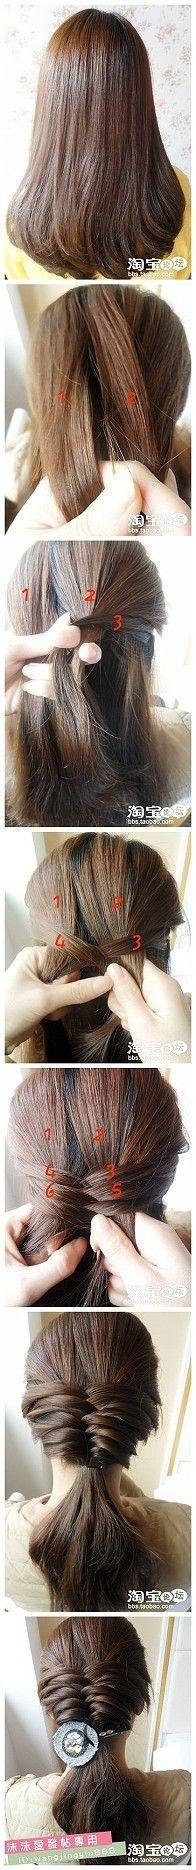 fishtail. minus the fish hair accessory